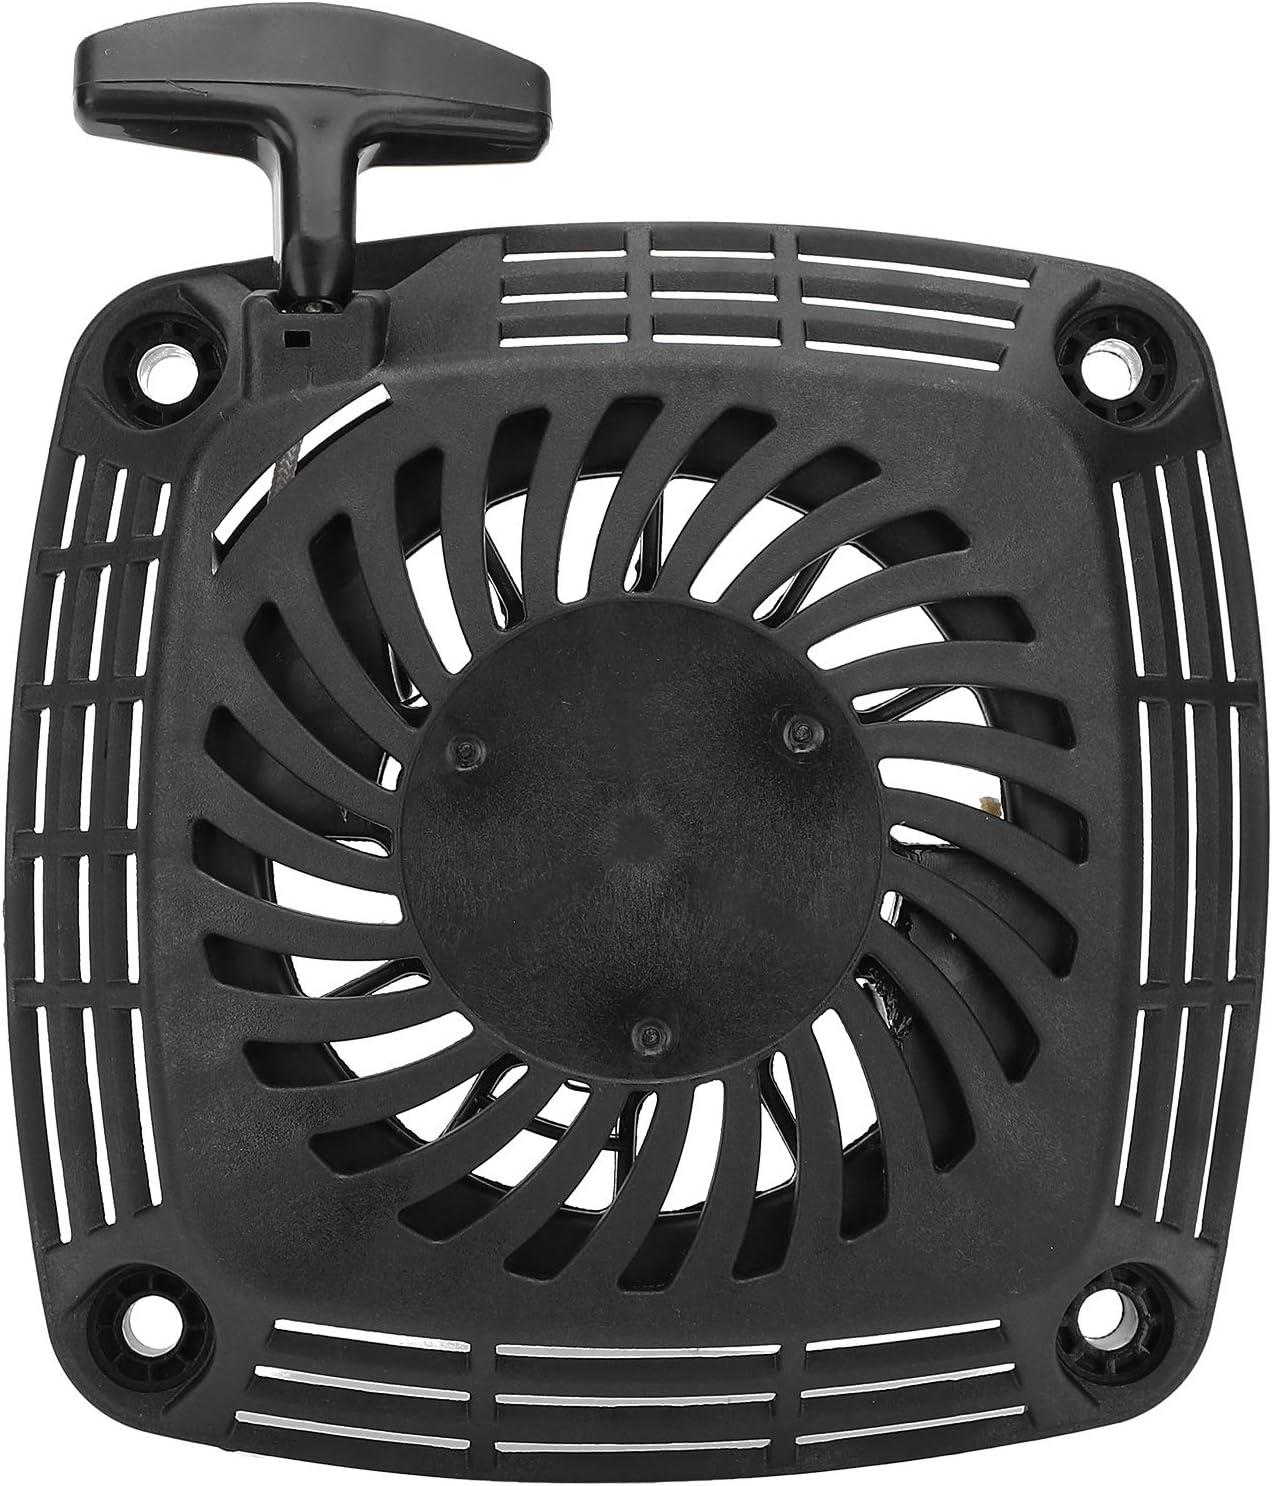 Kuuleyn Arrancador de Arrastre para Recortadora, Ajuste de Arranque de plástico para Kawasaki 49088‑2582 49088‑7023 FJ180V Reemplazo del Conjunto de cortacésped